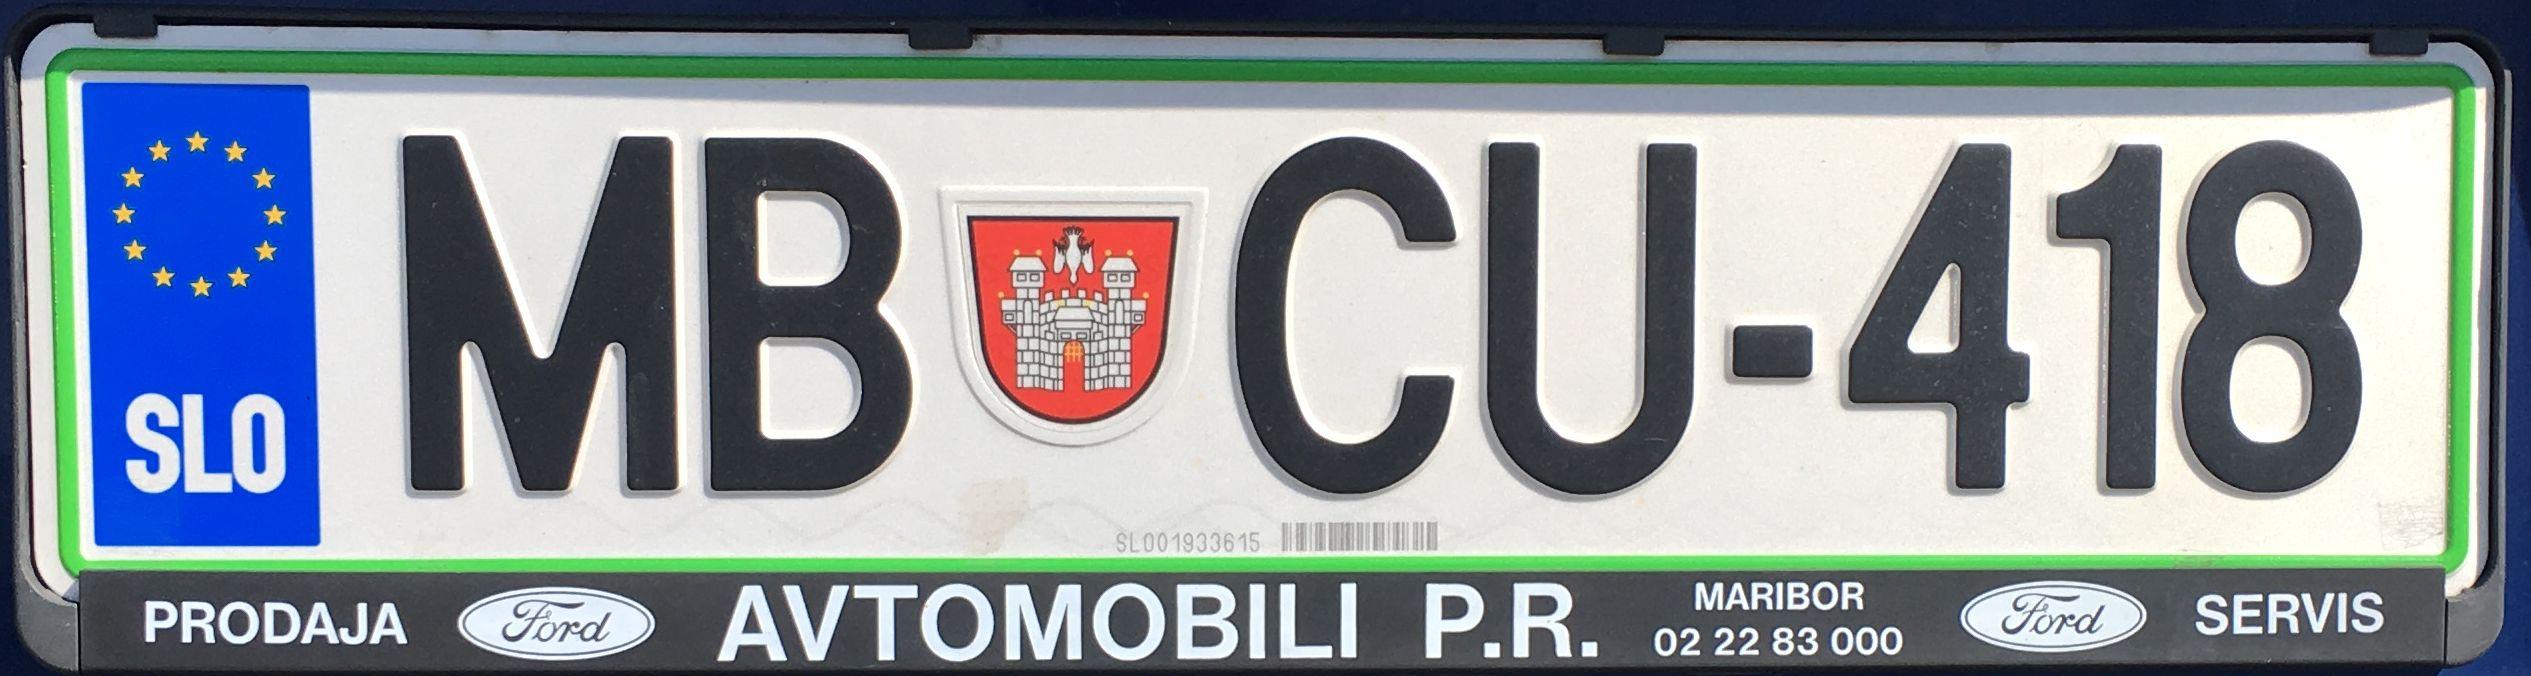 Registrační značka Slovinsko - MB - Maribor, foto: www.podalnici.cz